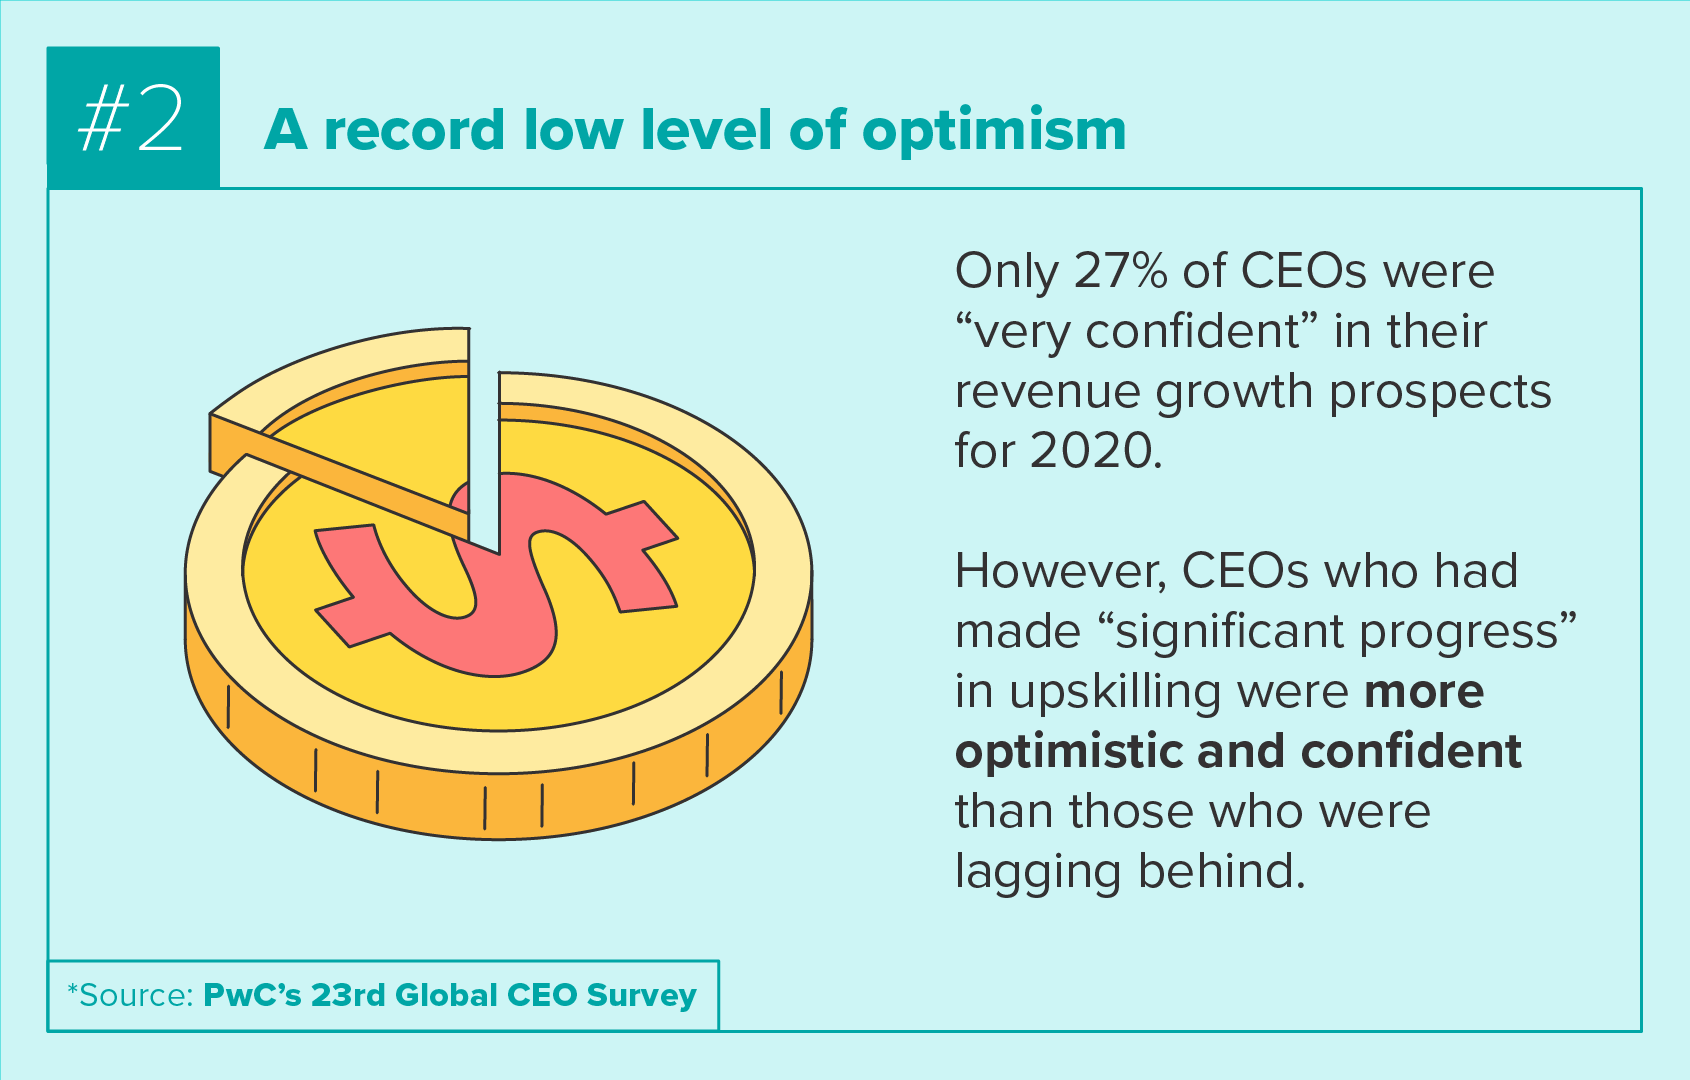 Lacking confidence and optimisim